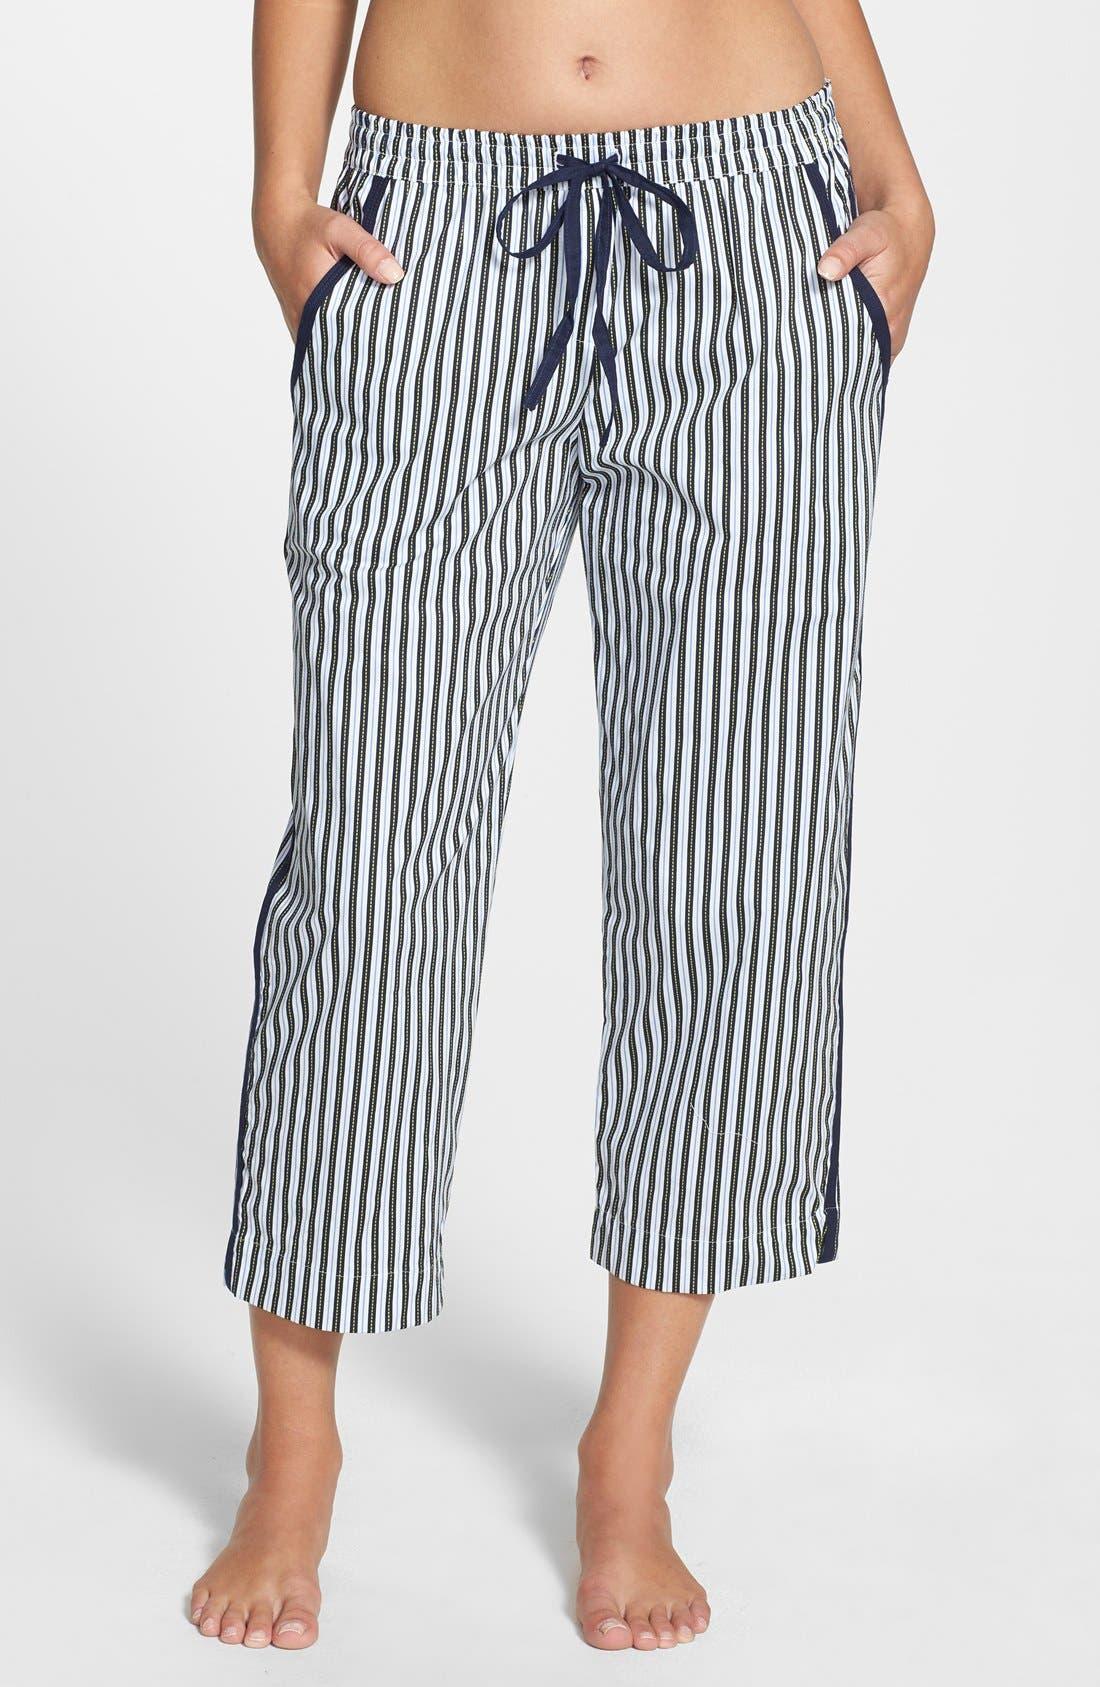 Main Image - DKNY 'Seaside Bliss' Cotton Capri Pants